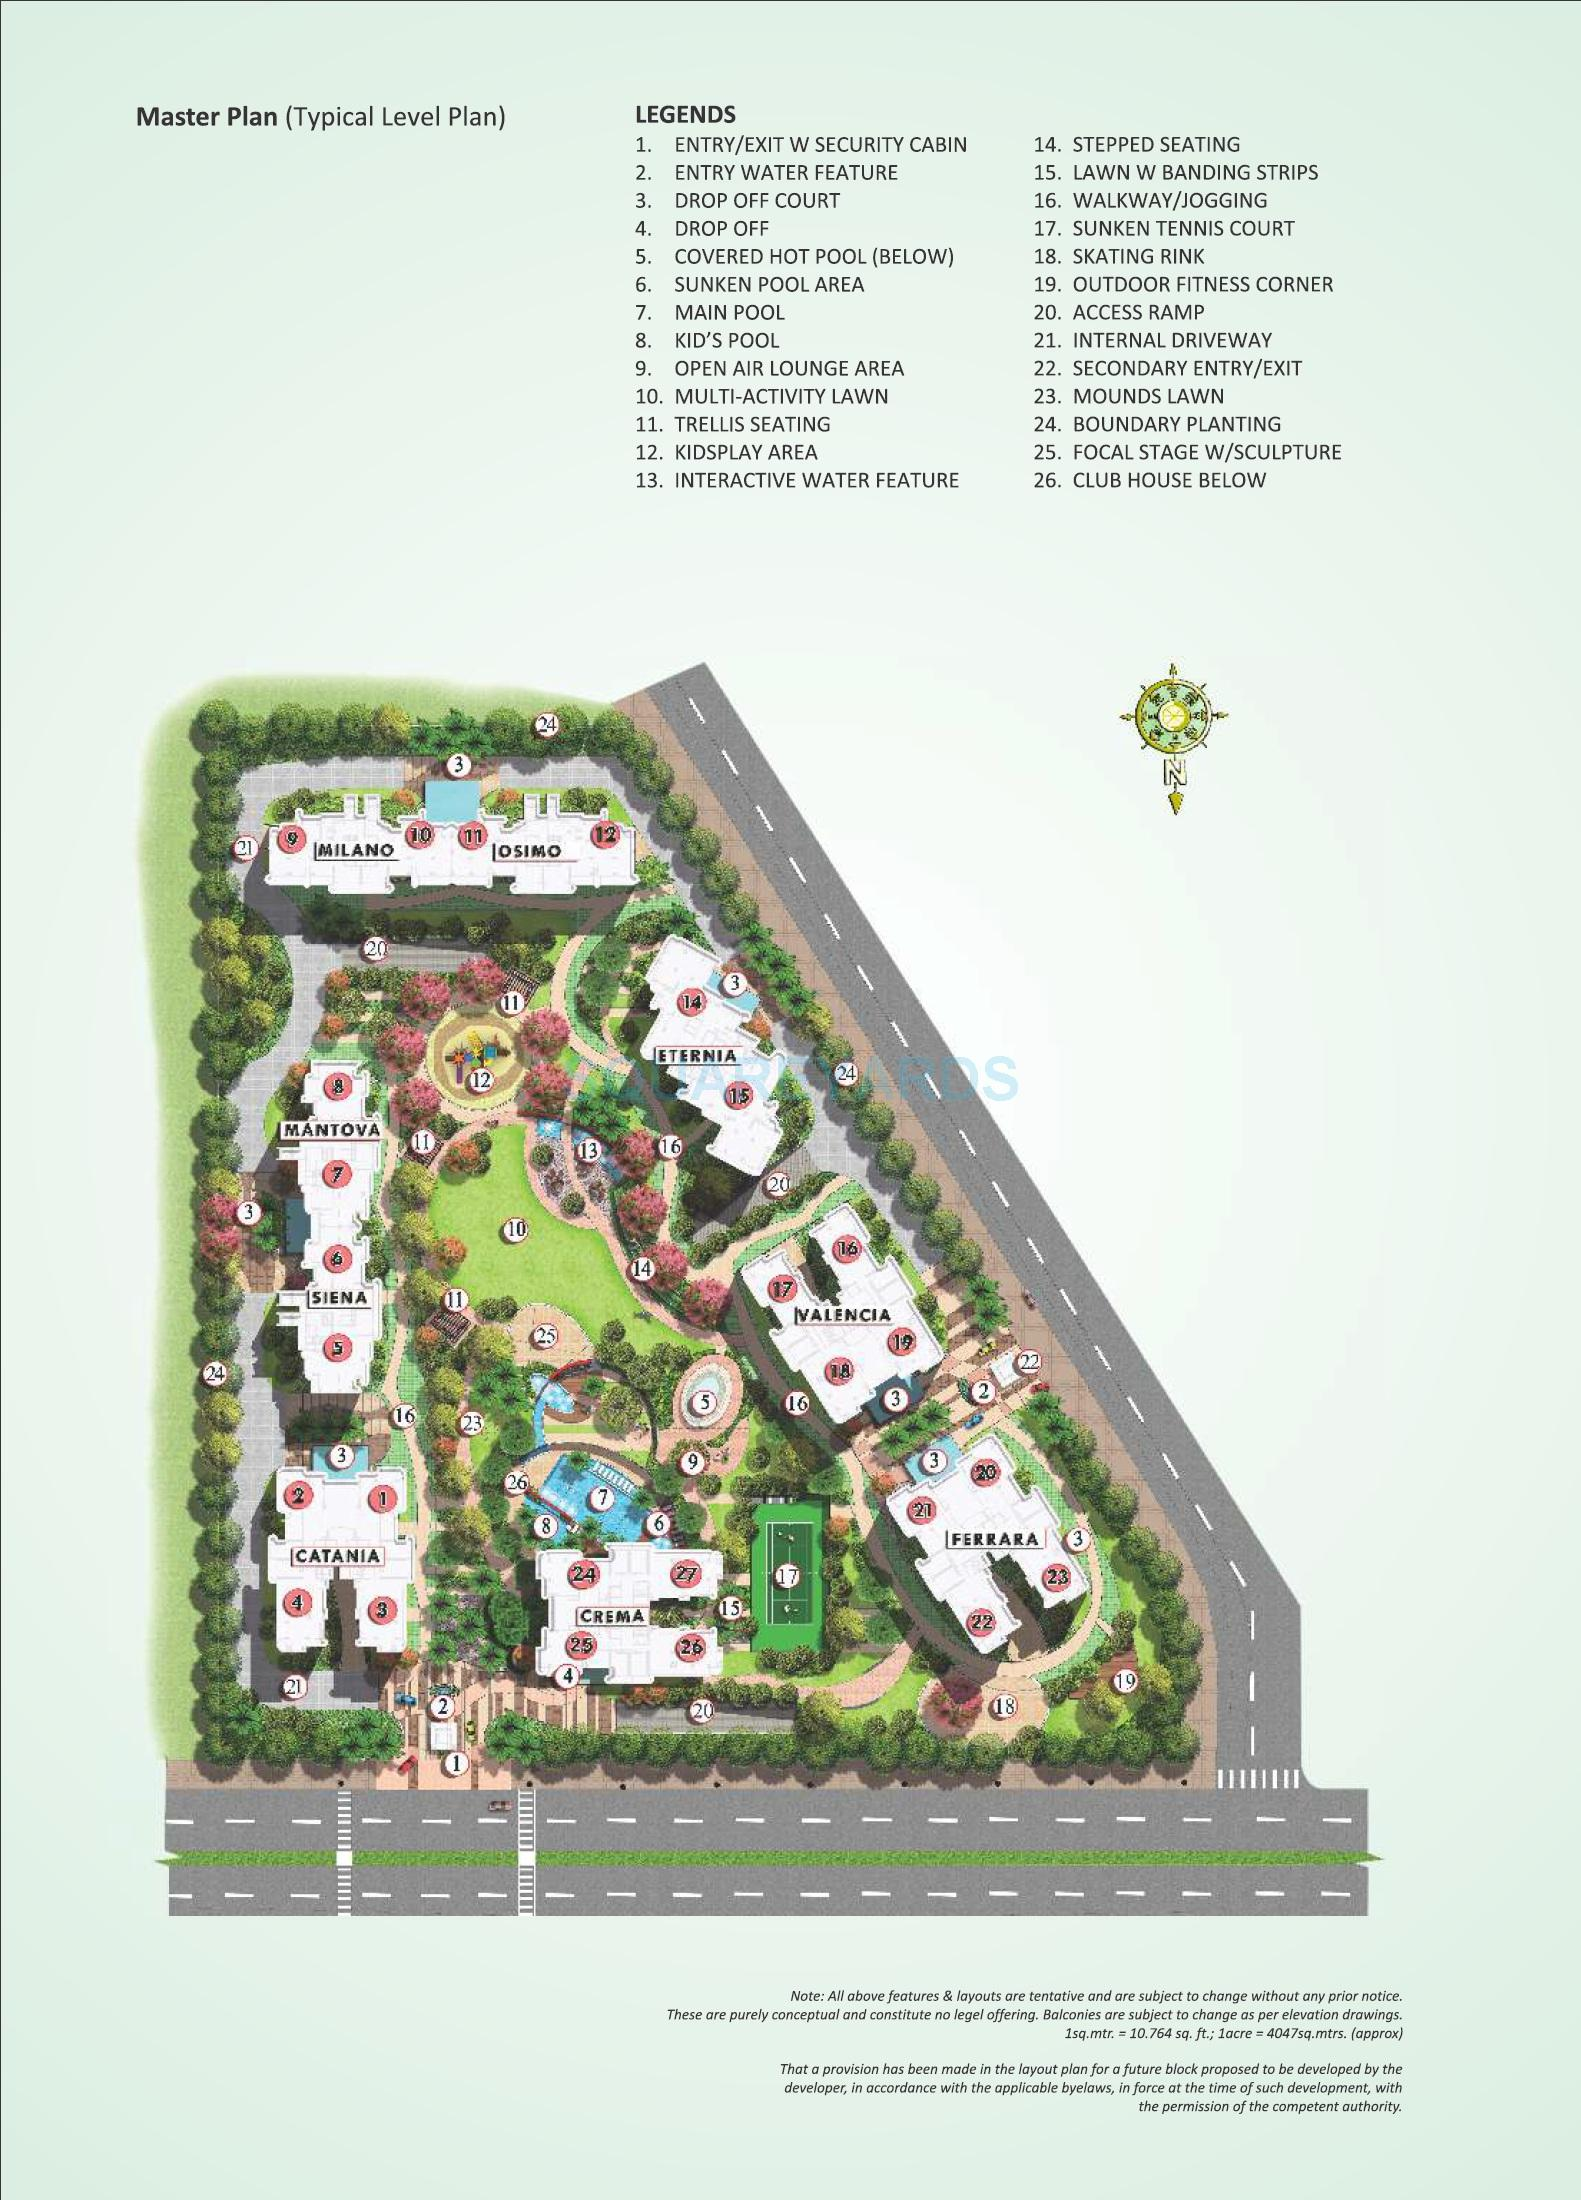 mahagun mezzaria master plan image1